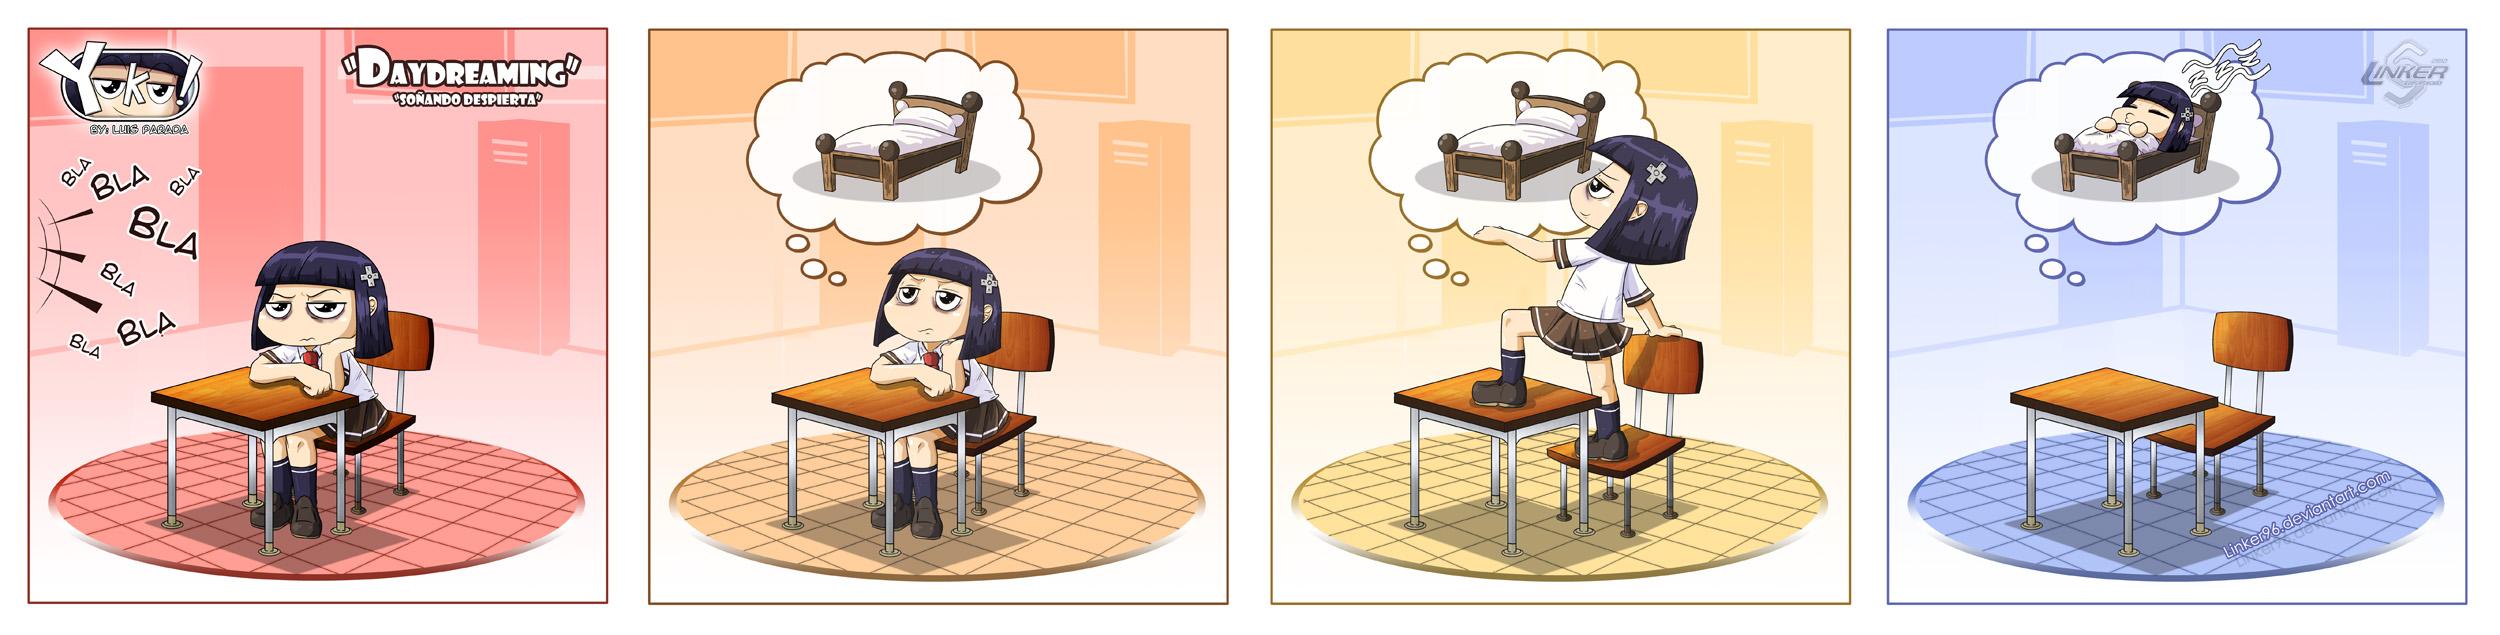 Yoko - Daydreaming